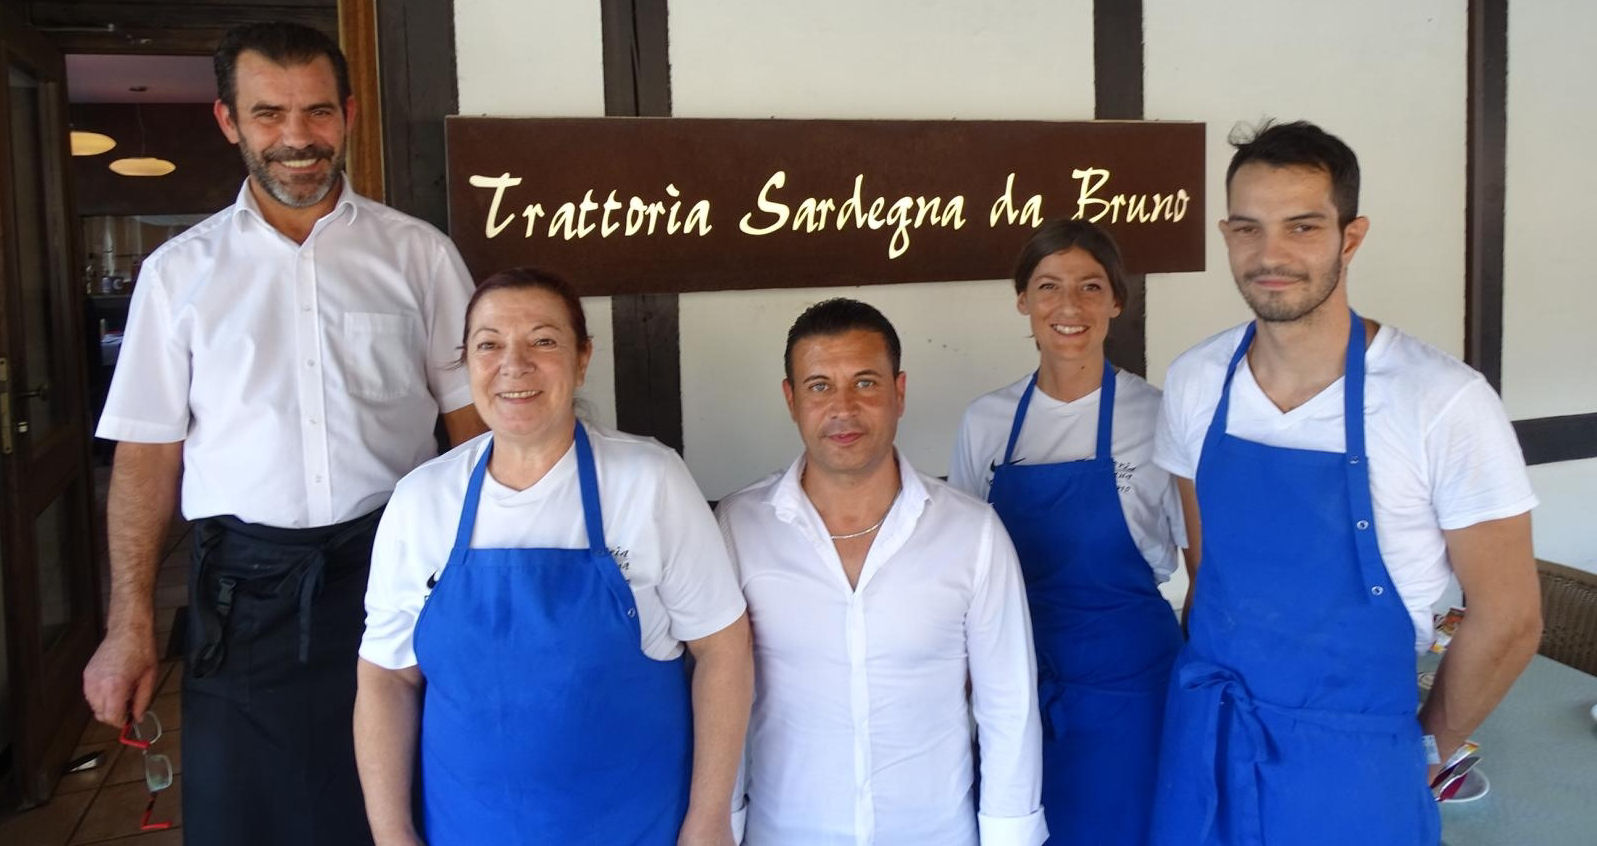 Trattoria Sardegna